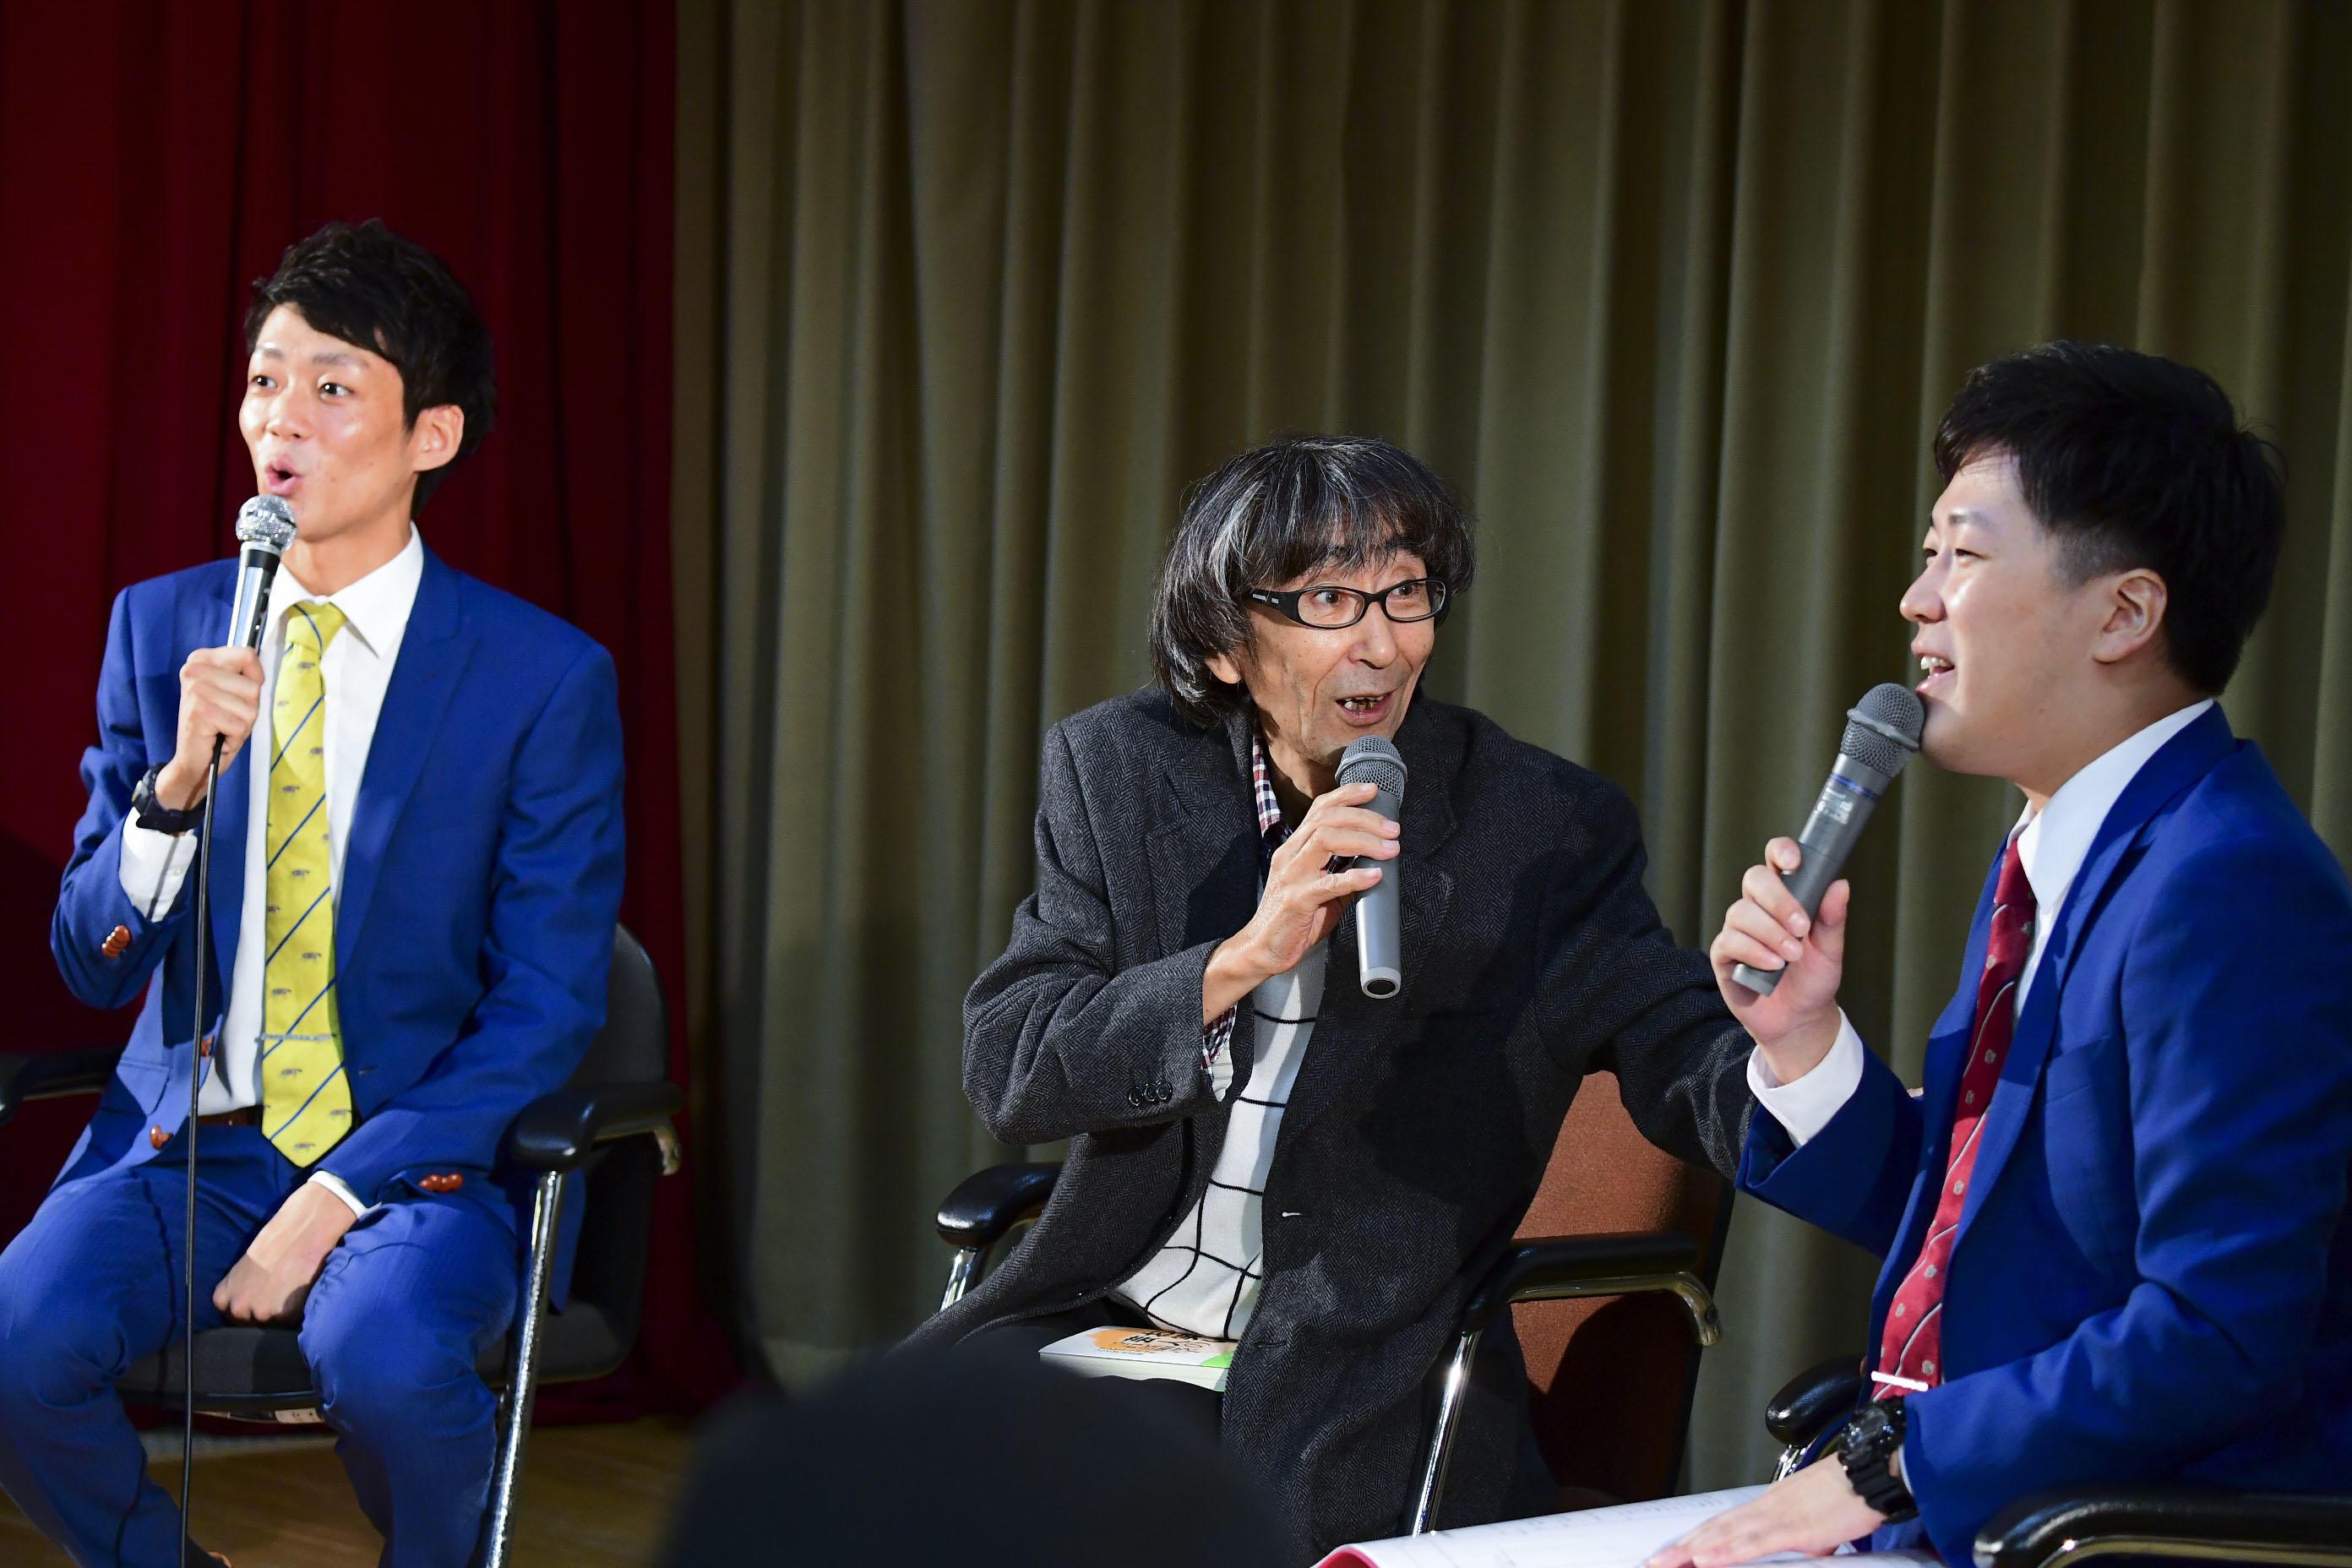 http://news.yoshimoto.co.jp/20171009101832-cd8da91de0f27e79c200444029881bcdbeaab168.jpg